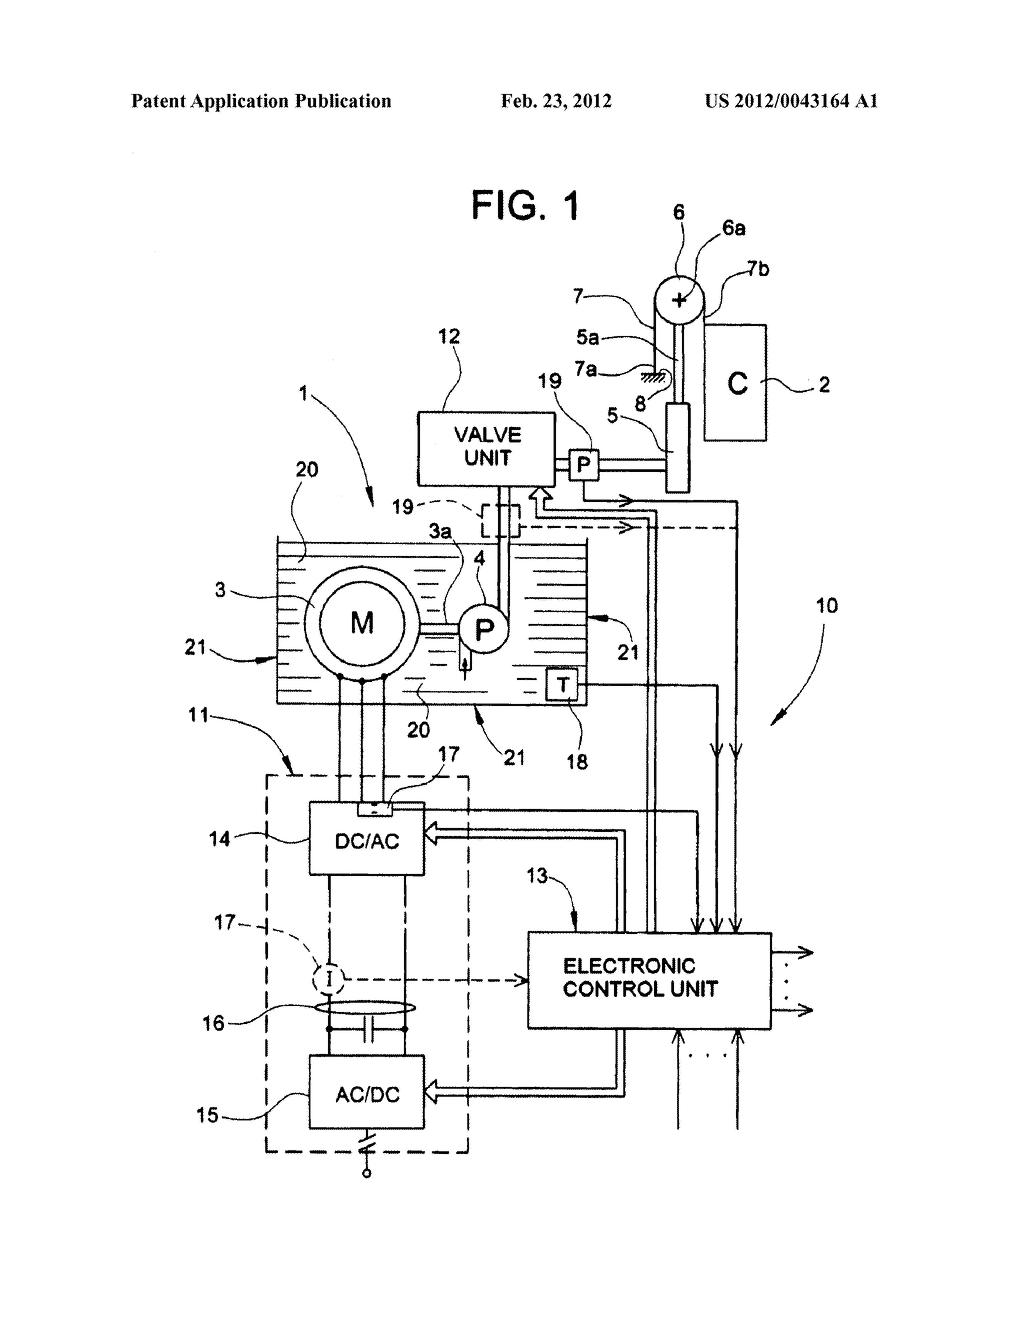 hight resolution of hydraulic elevator schematic control diagram wiring diagram user control system for a hydraulic elevator apparatus diagram